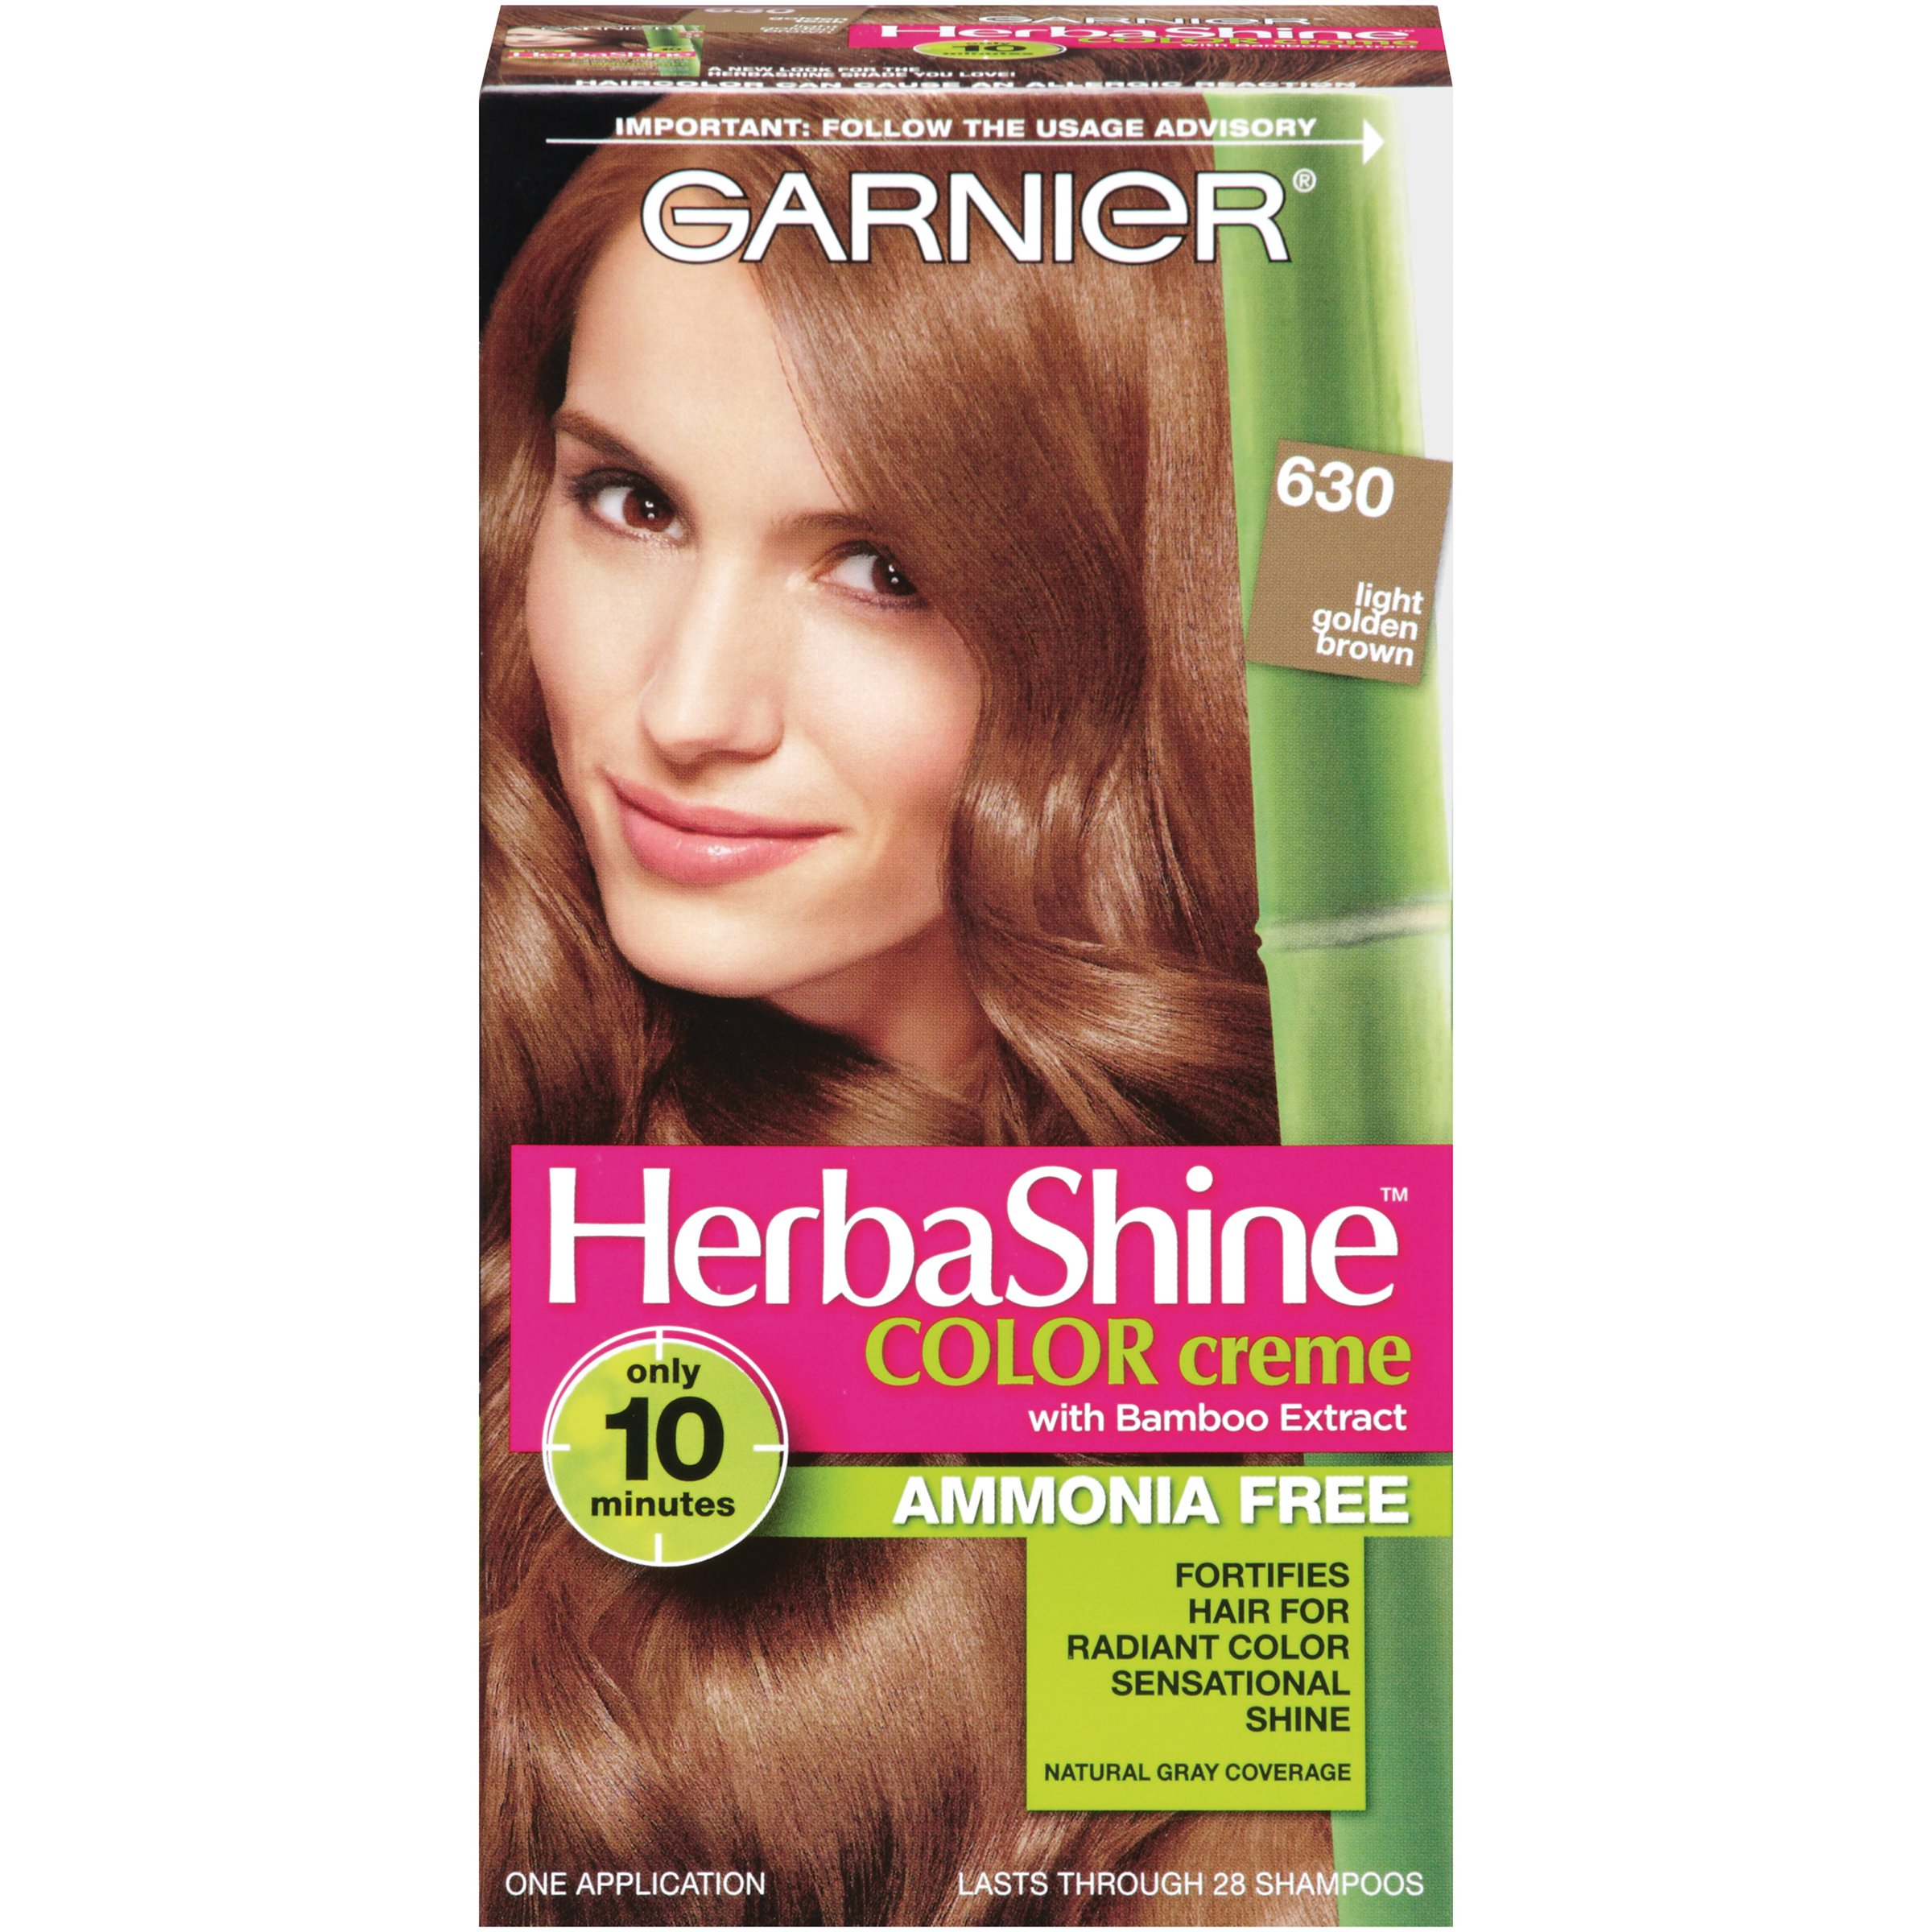 Amazon.com : Garnier Herbashine Haircolor, 632 Light Warm Brown : Chemical Hair Dyes : Beauty